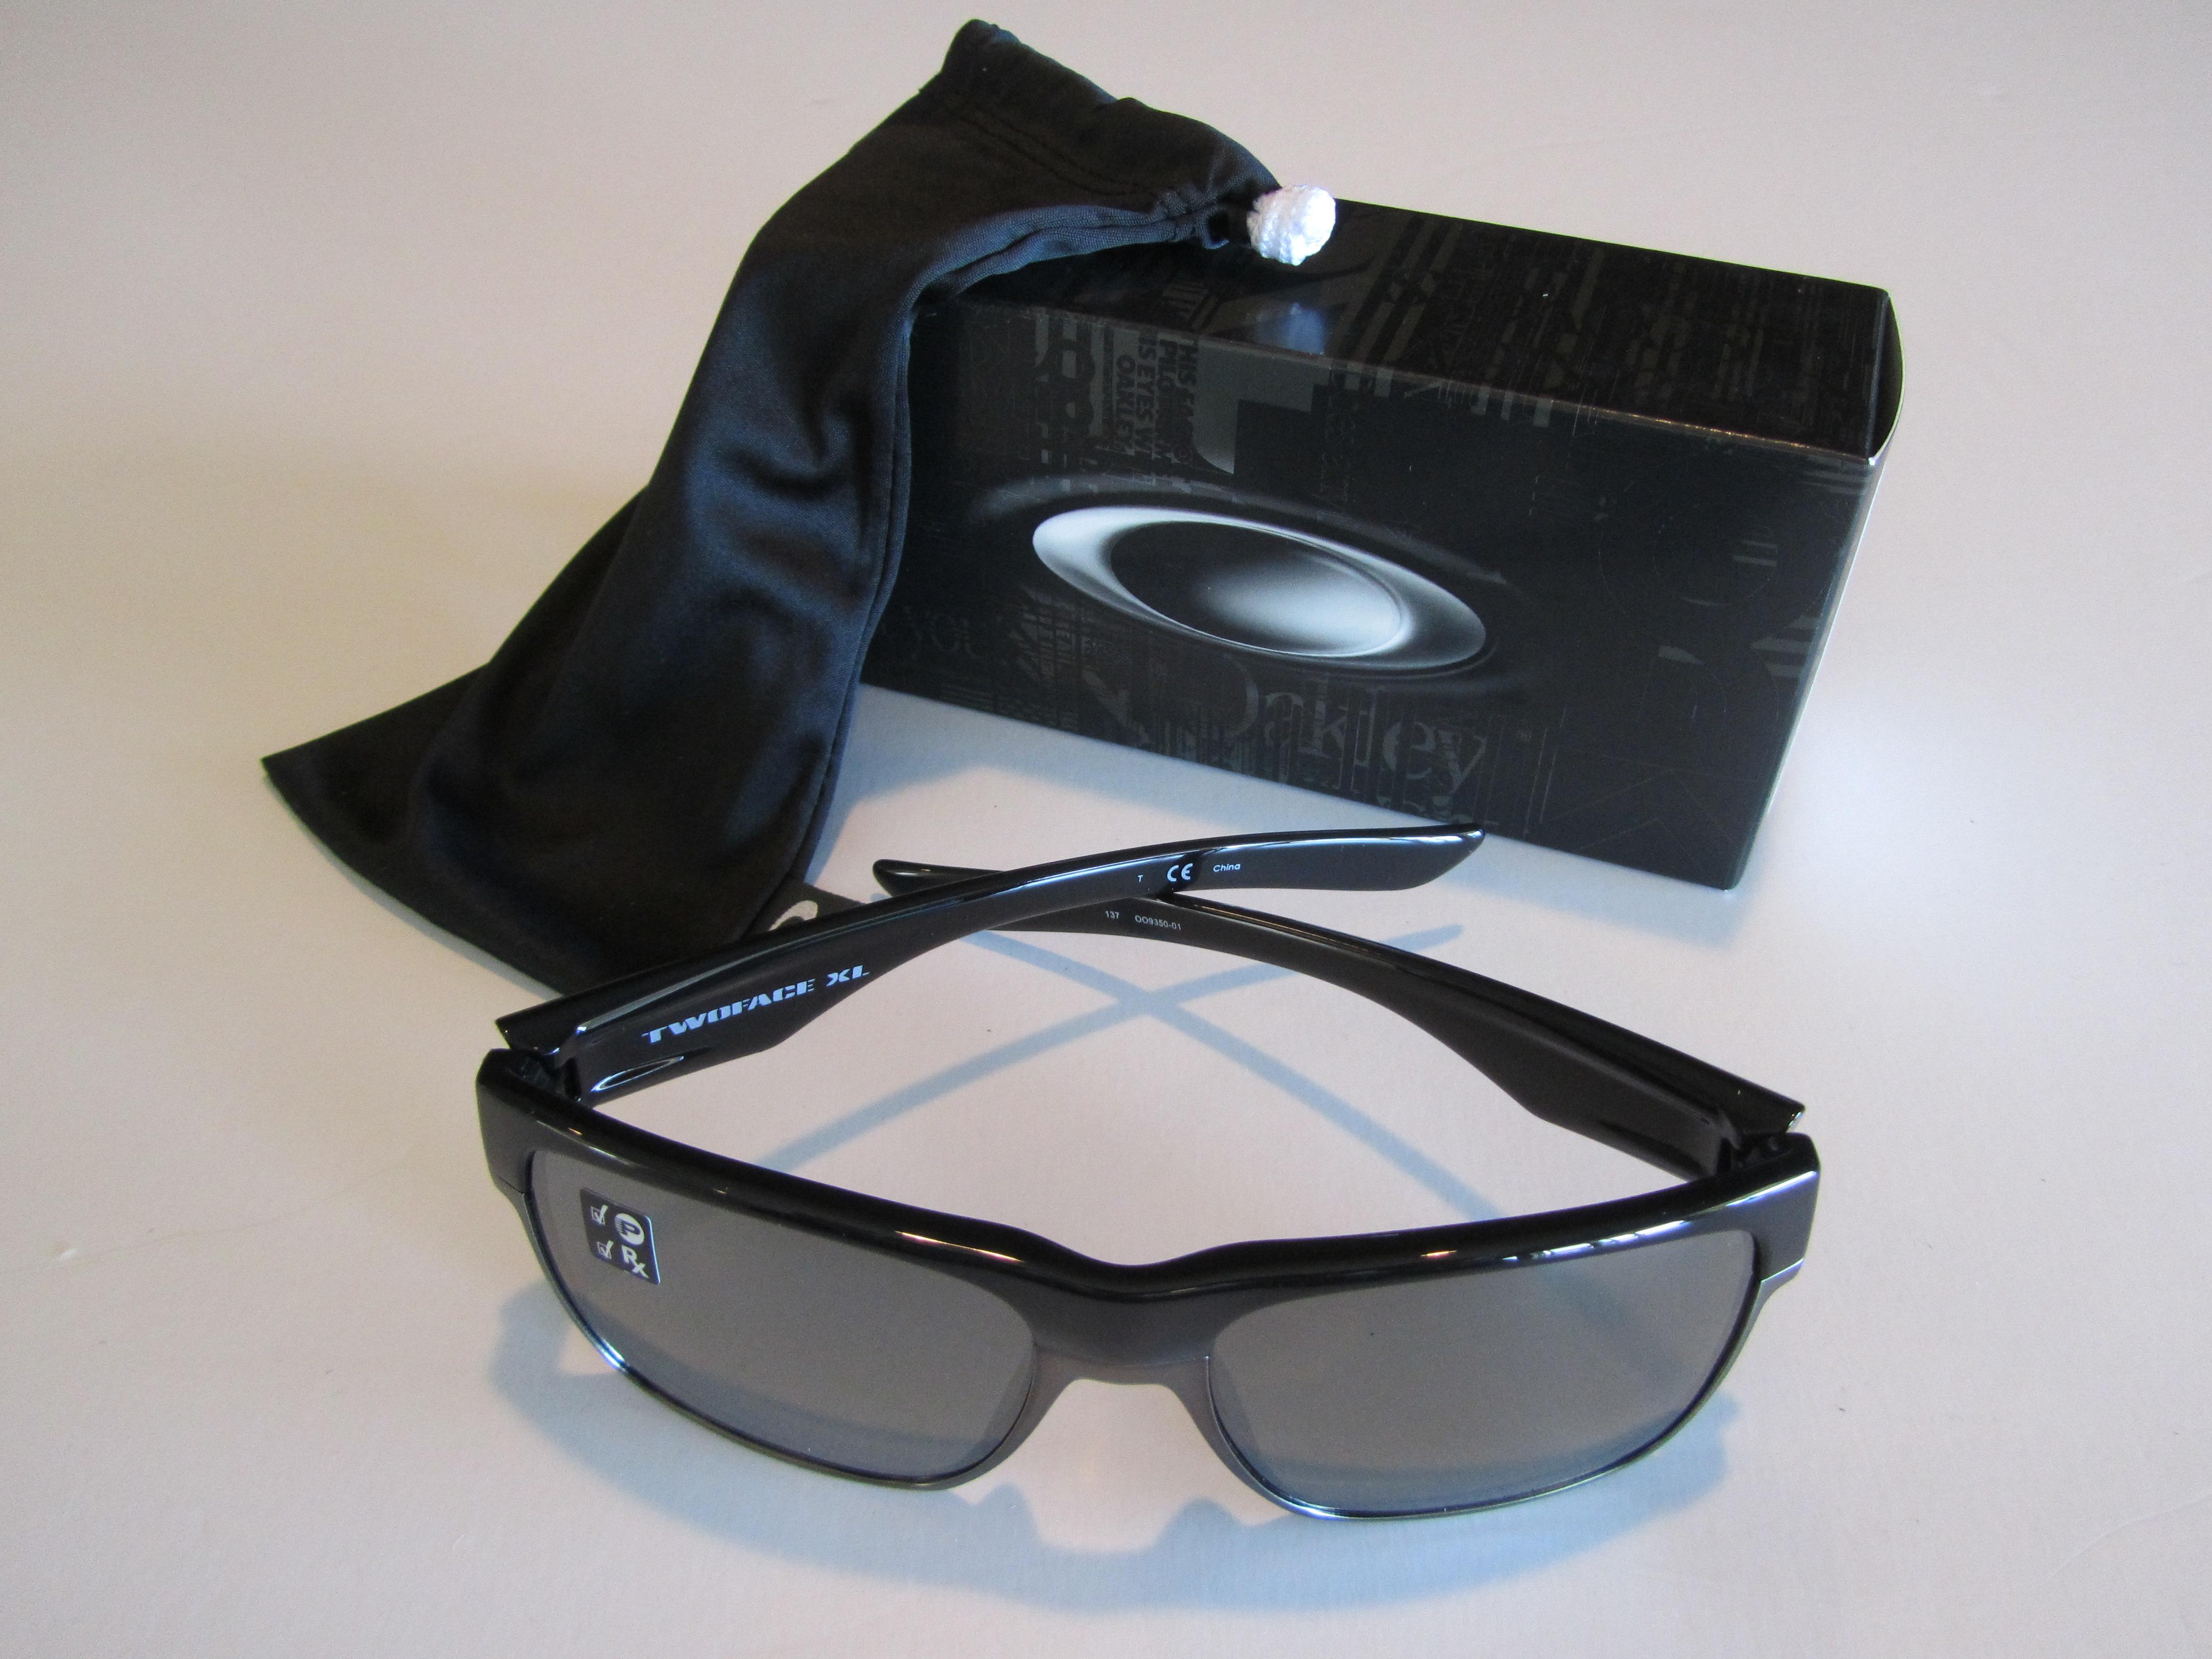 091b4a652f Oakley Two Face XL Sunglasses Polished Black Iridium Polarized ...